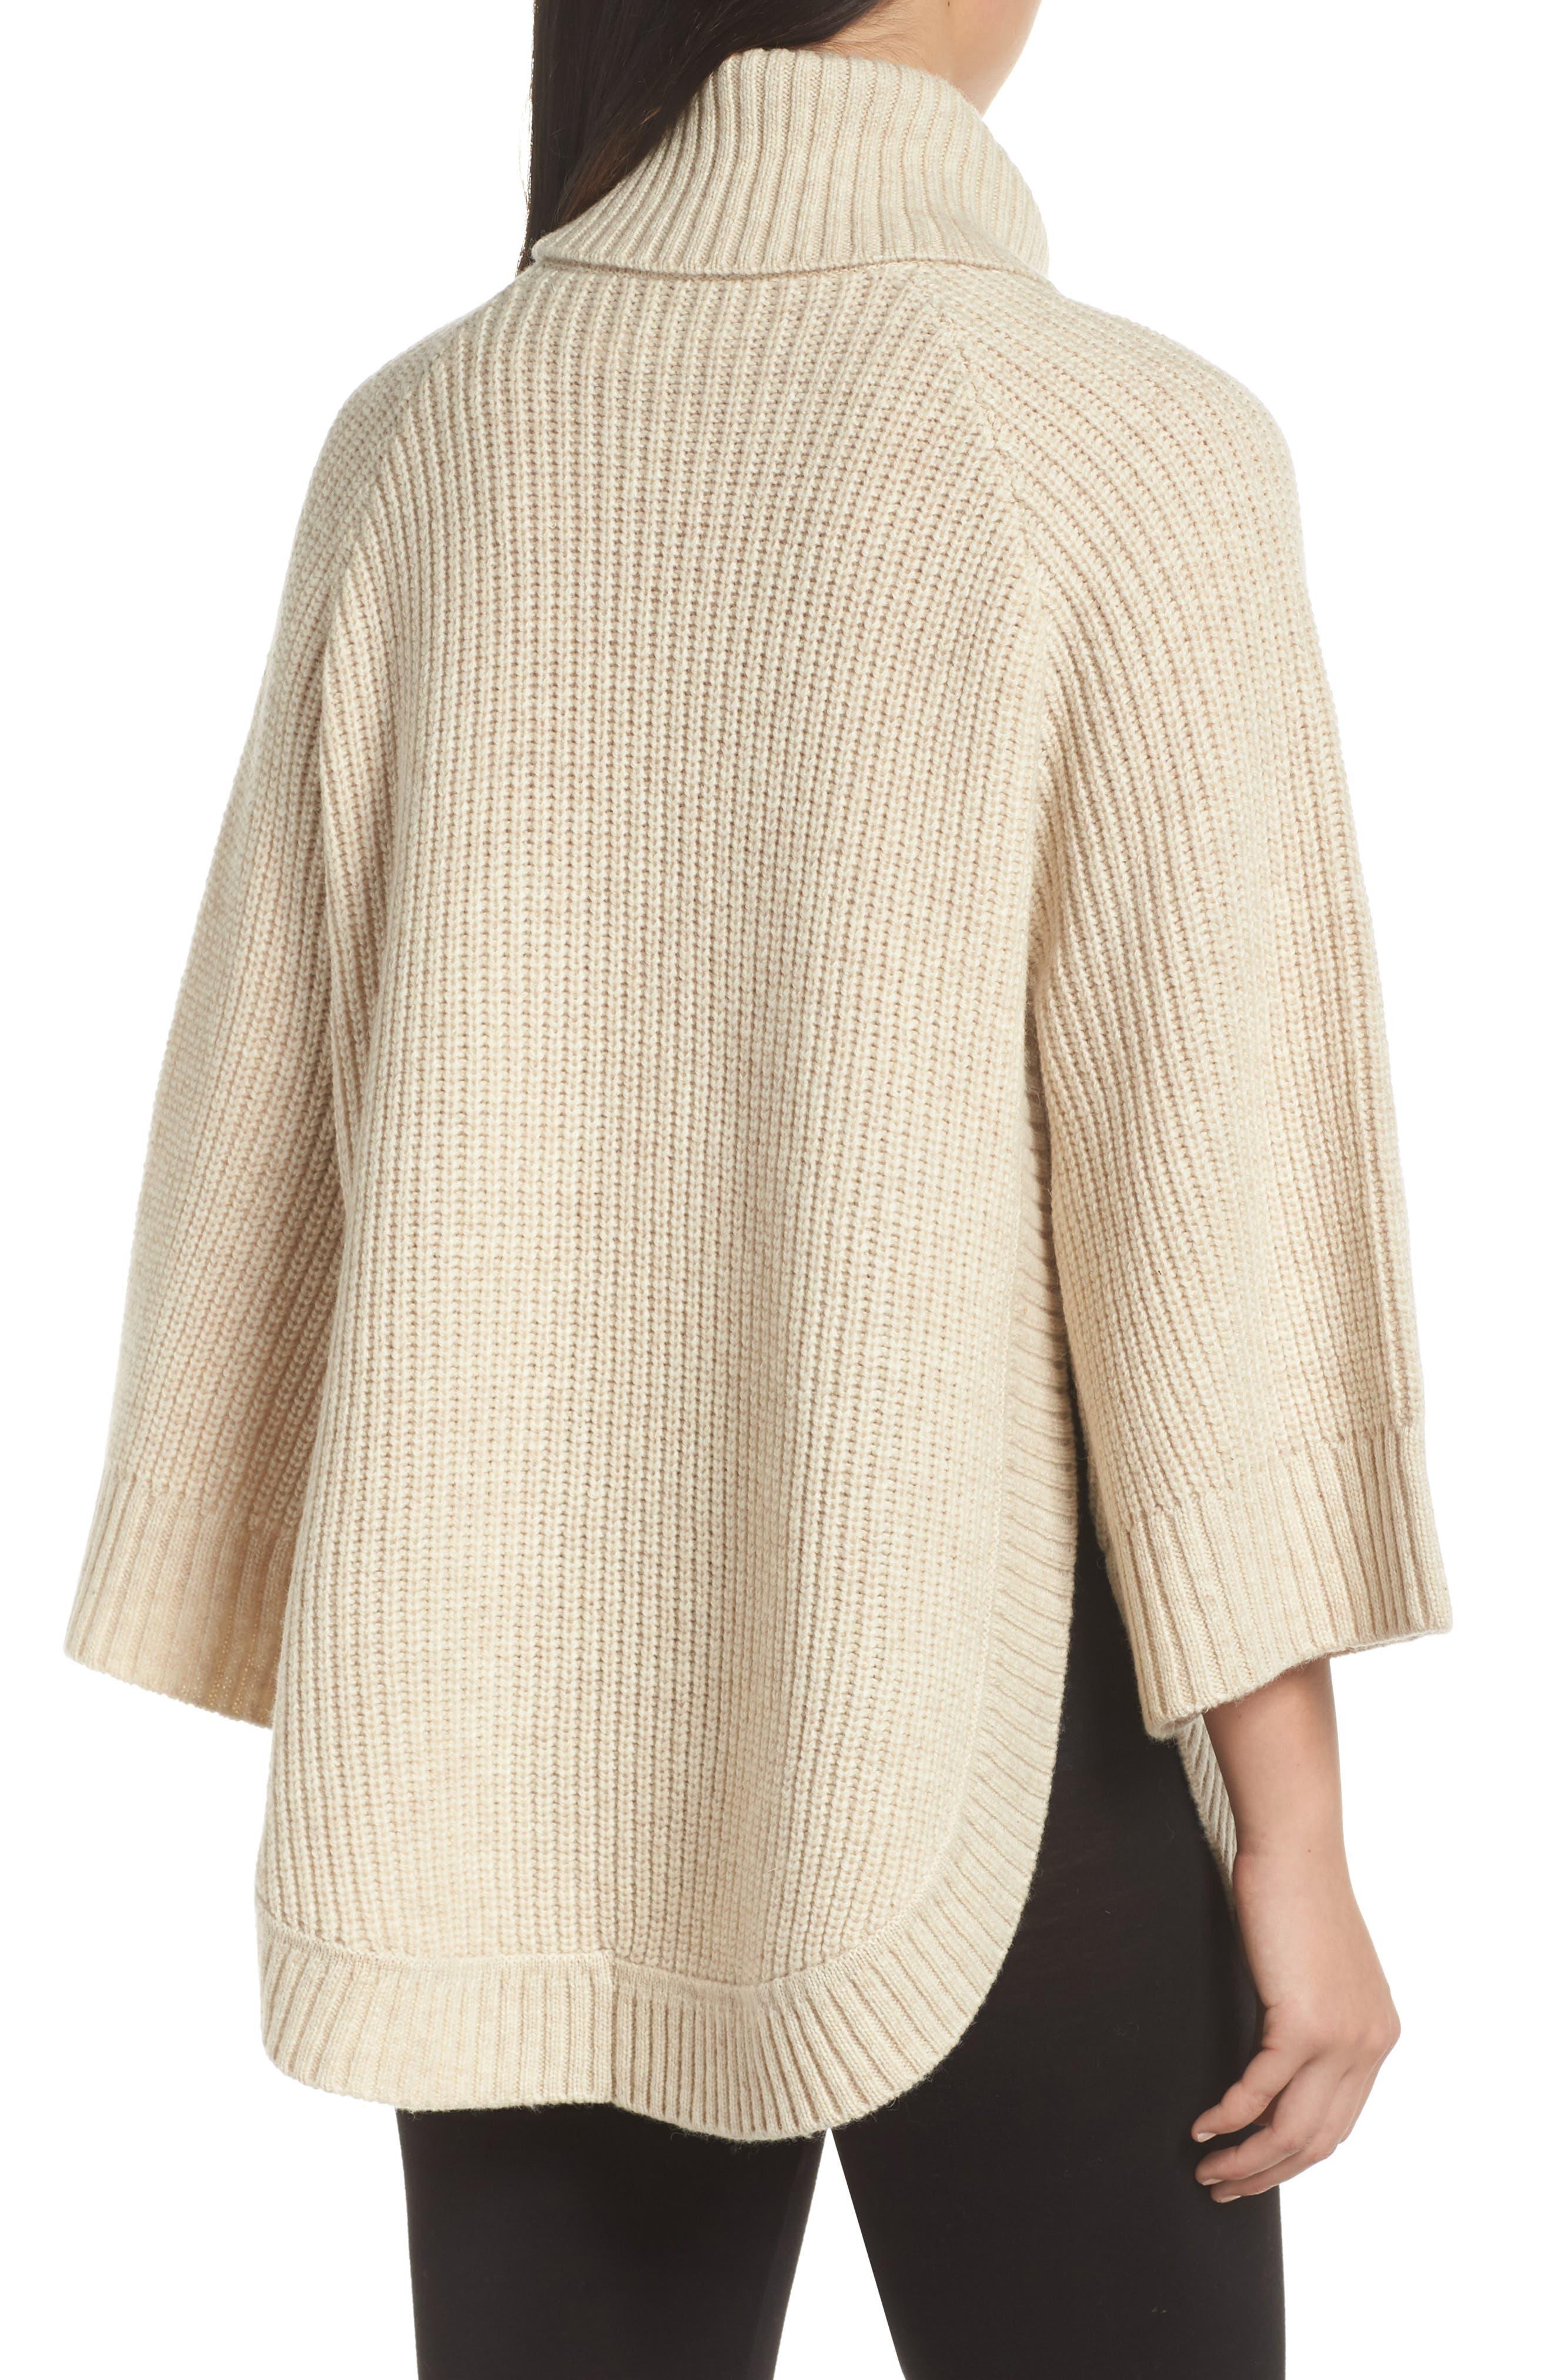 Raelynn Sweater Poncho,                             Alternate thumbnail 2, color,                             CREAM HEATHER